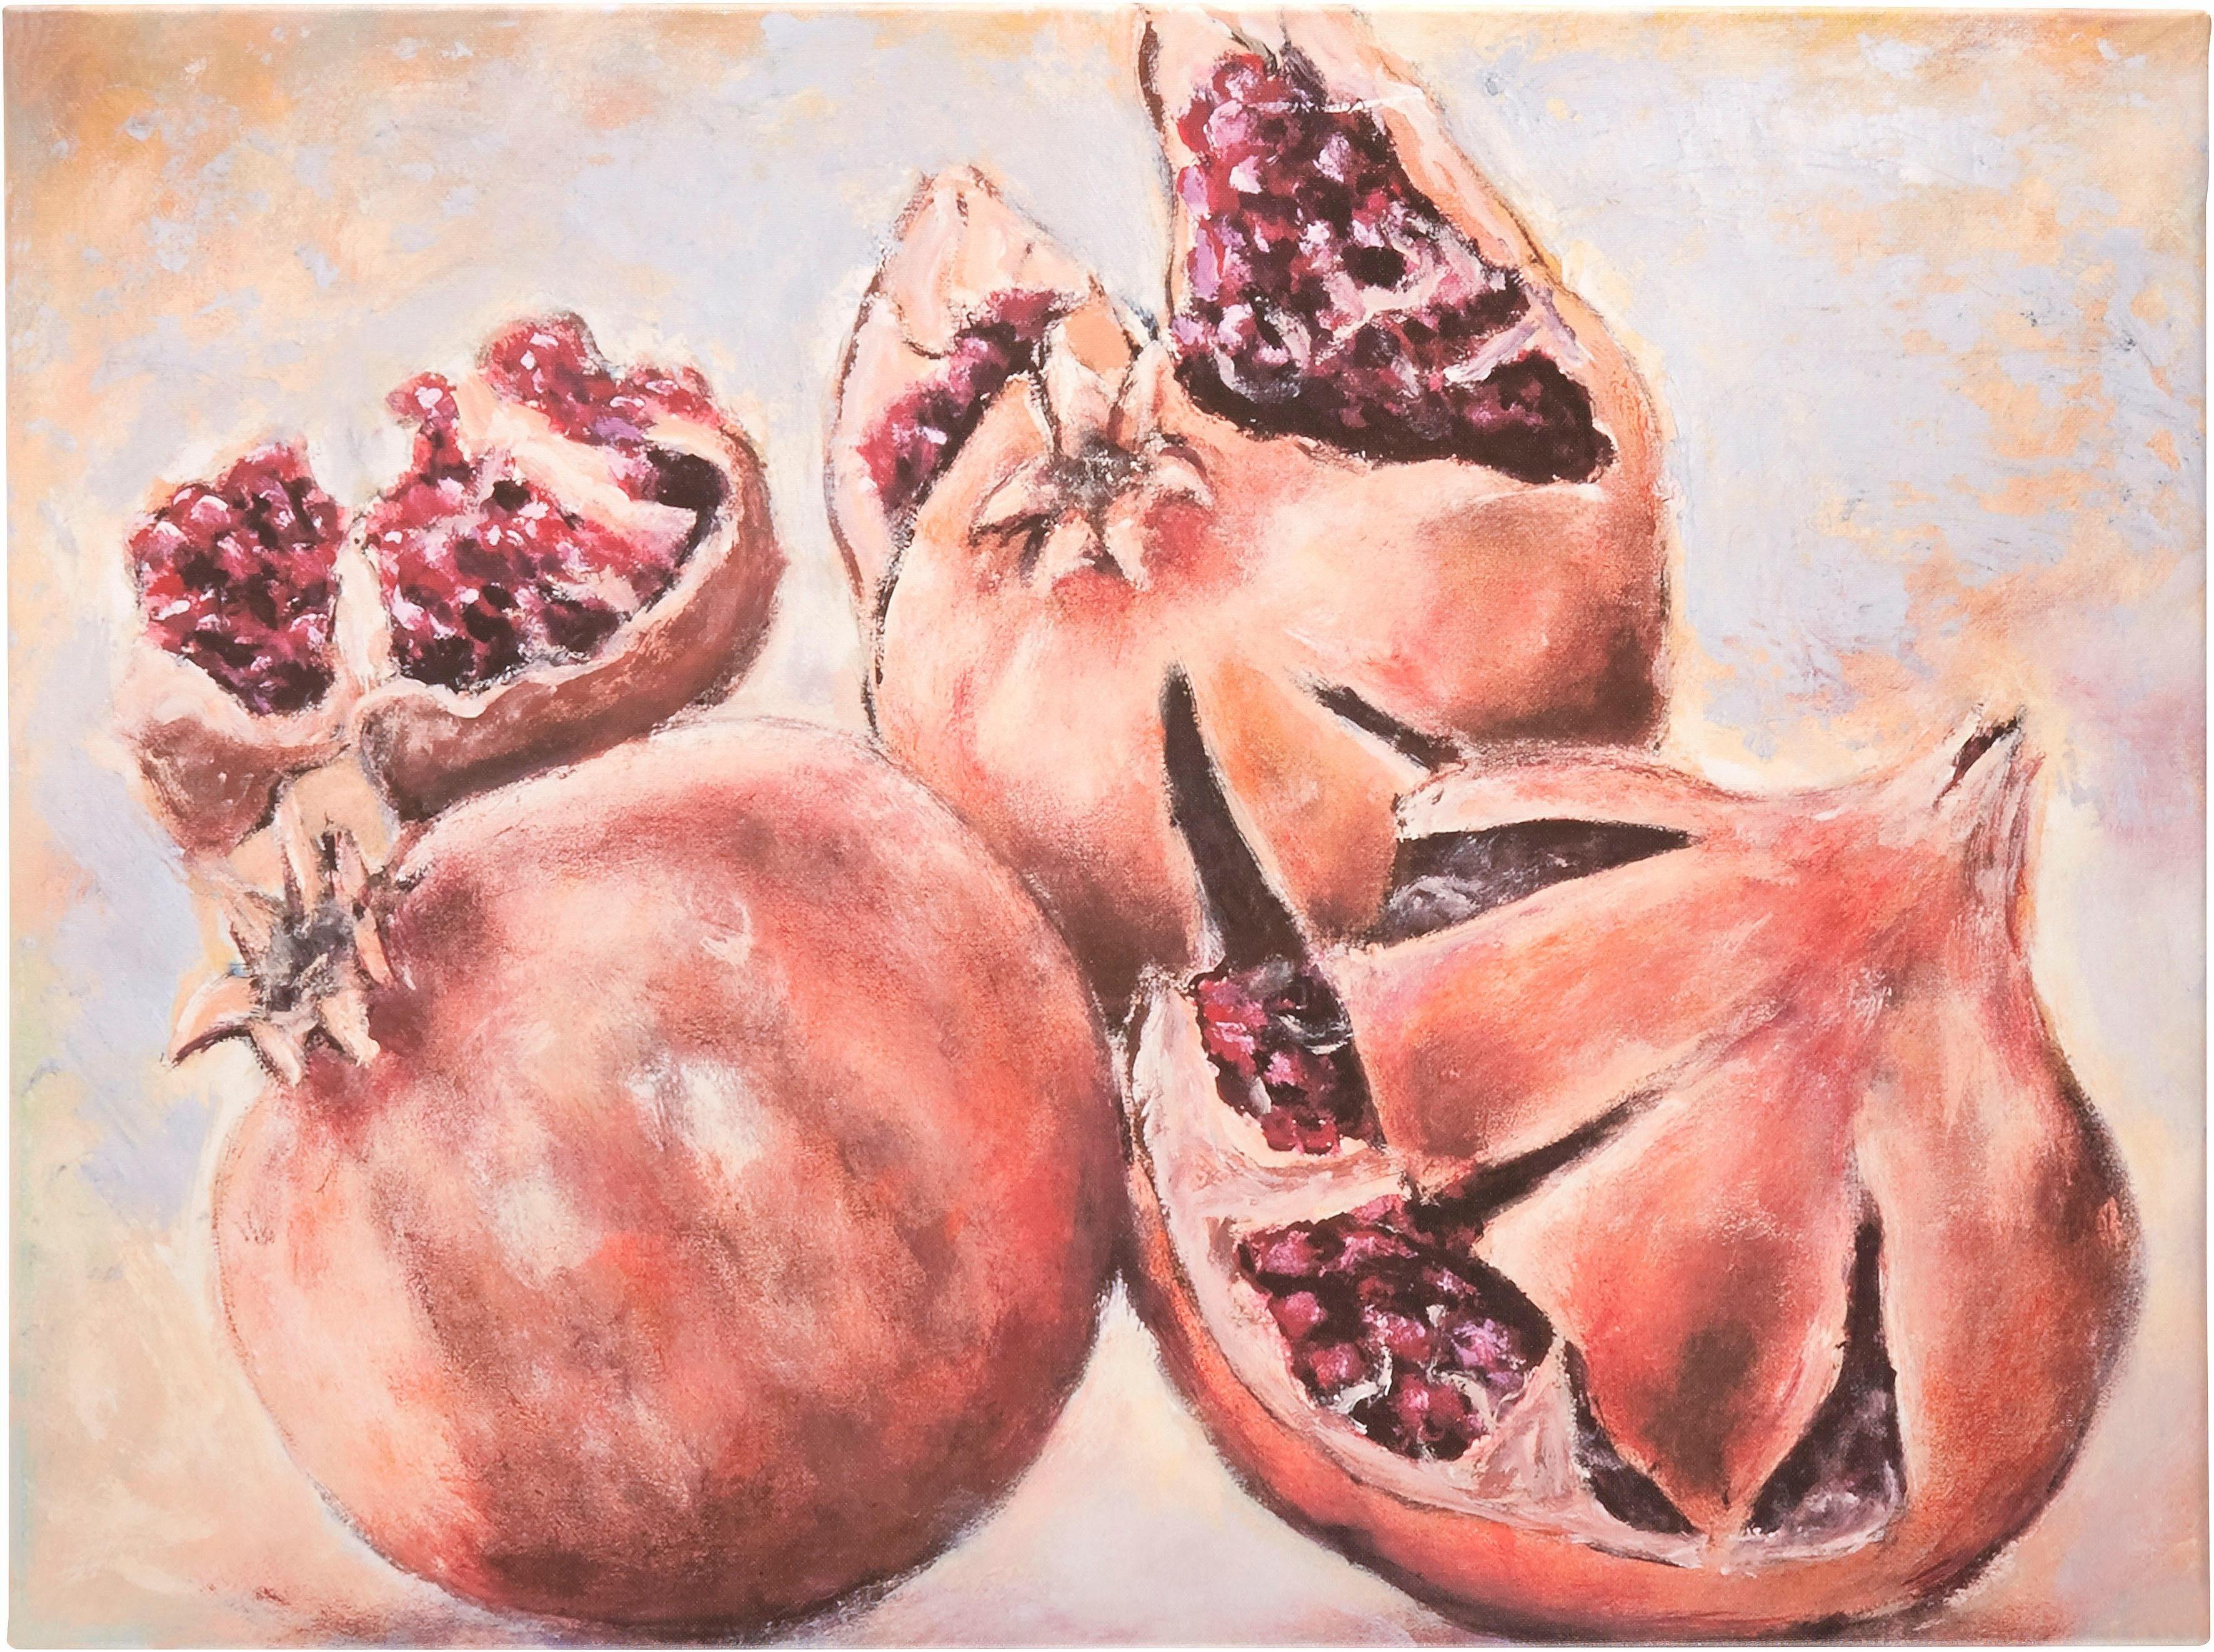 Guido Maria Kretschmer Home&Living Leinwandbild »Granatäpfel«, Obst, von Frank Mutters, gerahmt, Keilrahmen